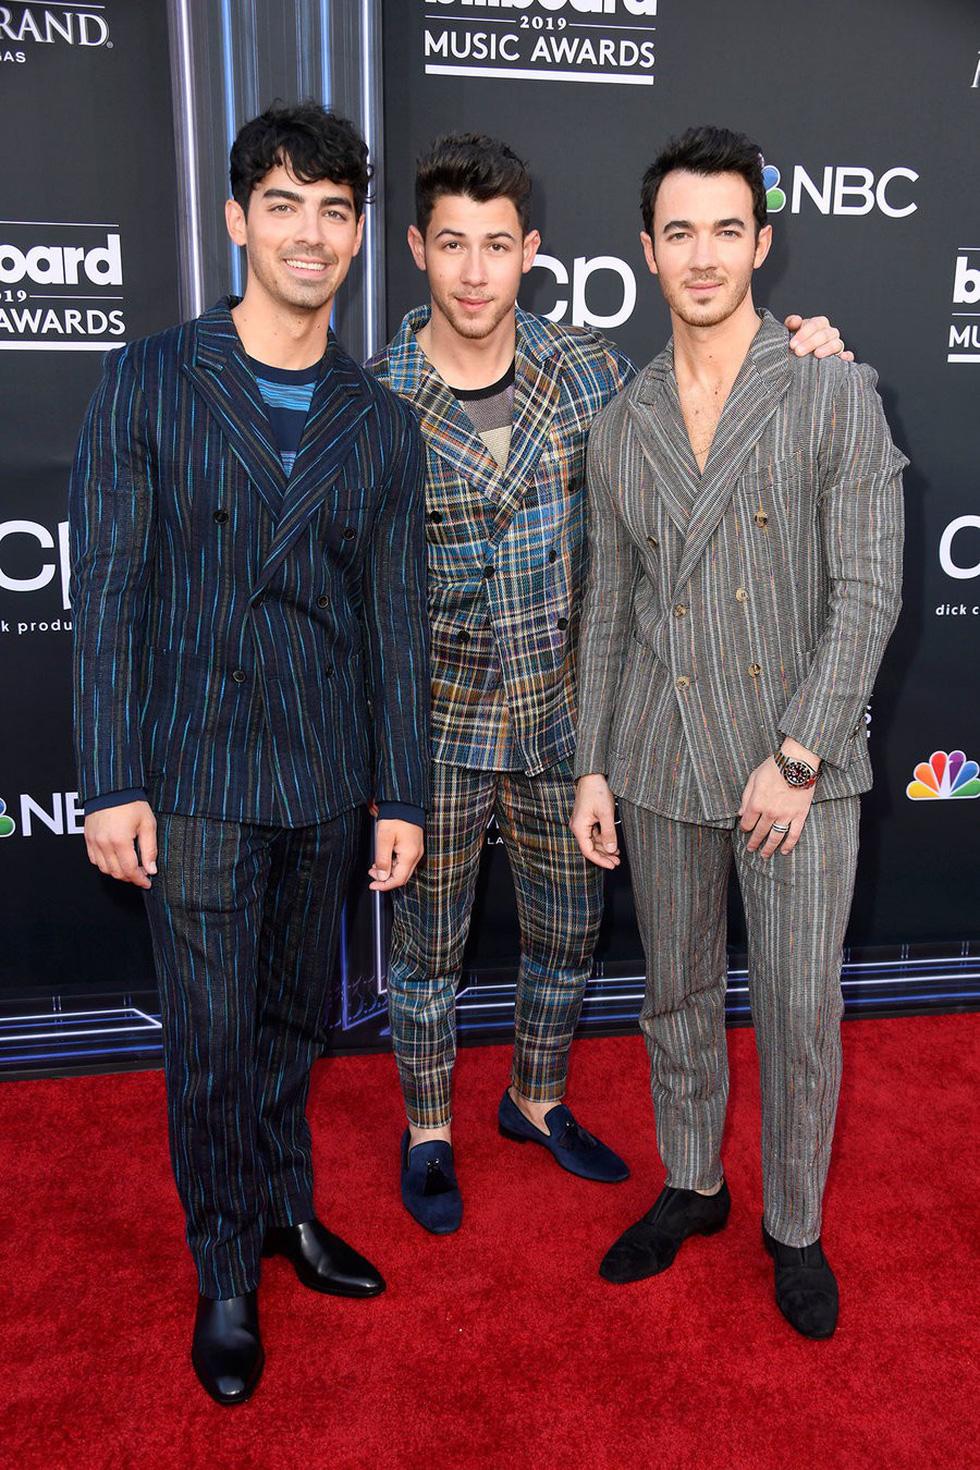 BTS đánh bại Maroon 5, Imagine Dragons tại Billboard Music Awards - Ảnh 7.